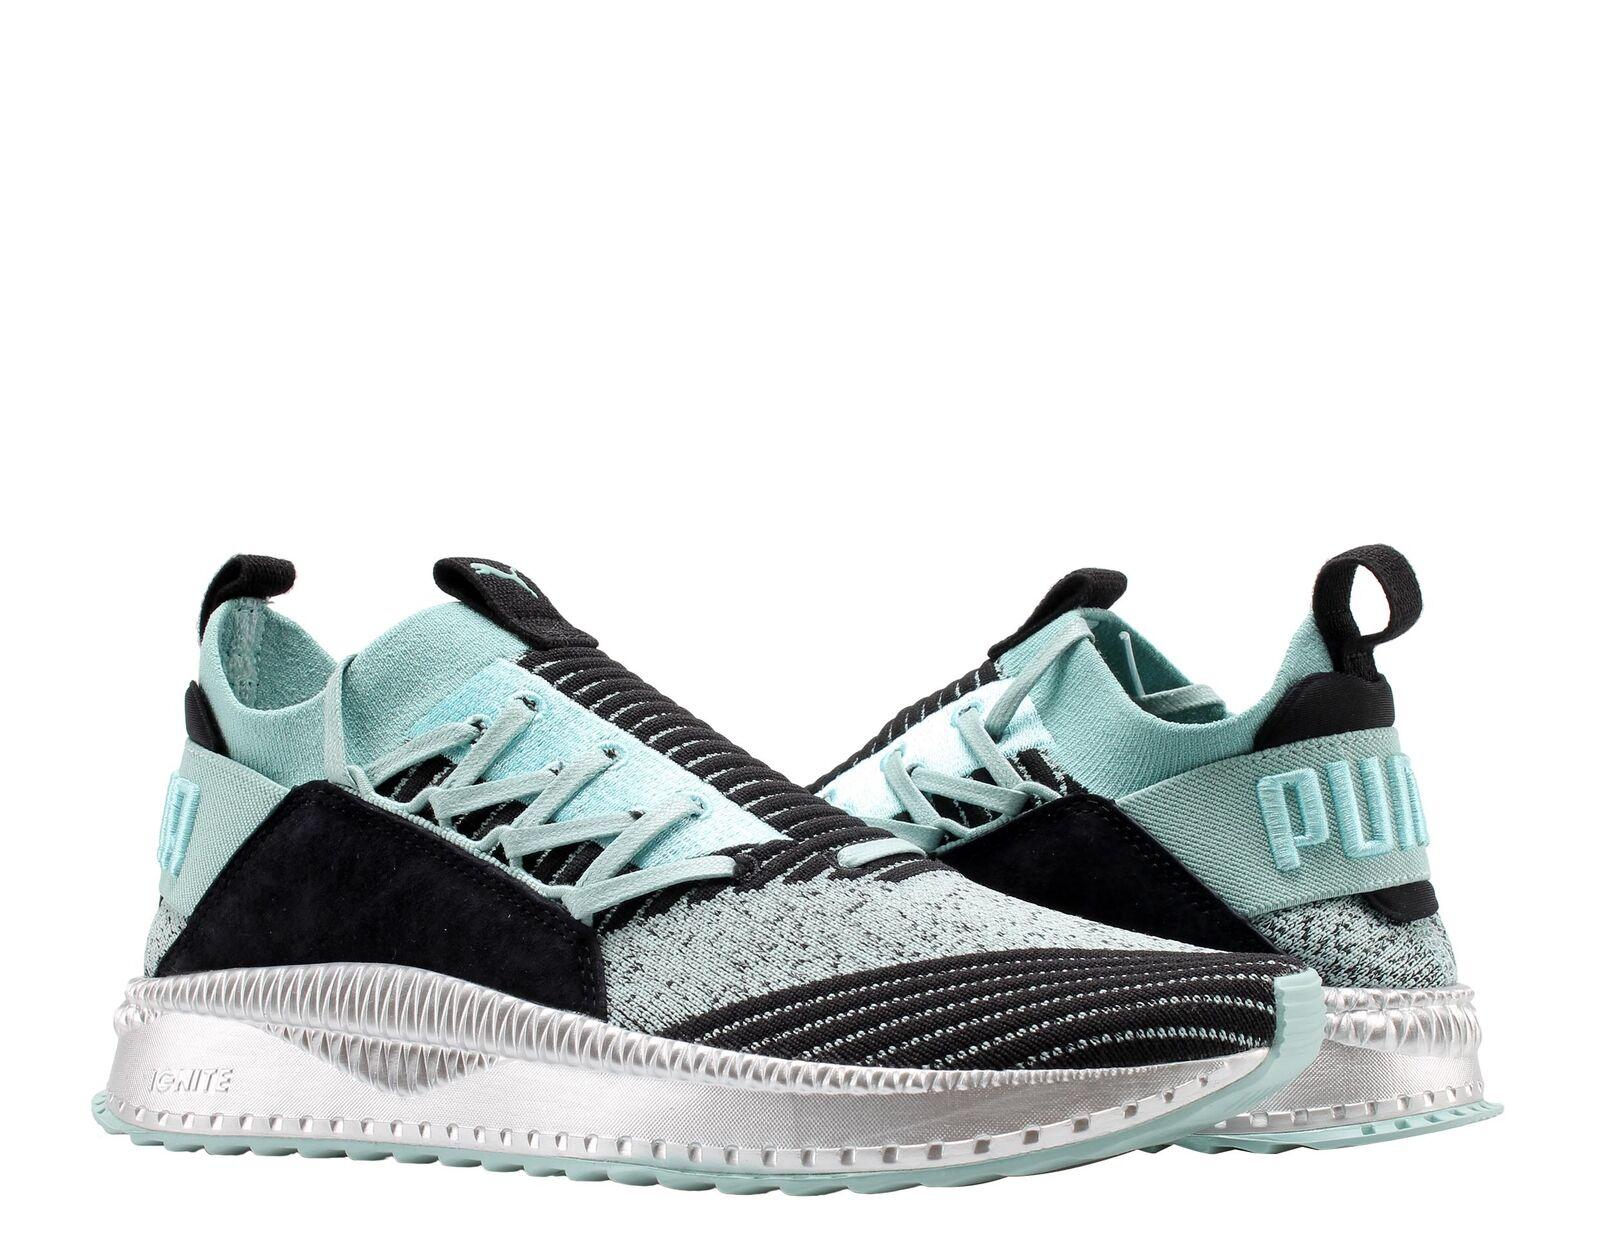 Puma TSUGI Jun TD Aquifer-Black-Silver Men's Casual Sneakers 36702001